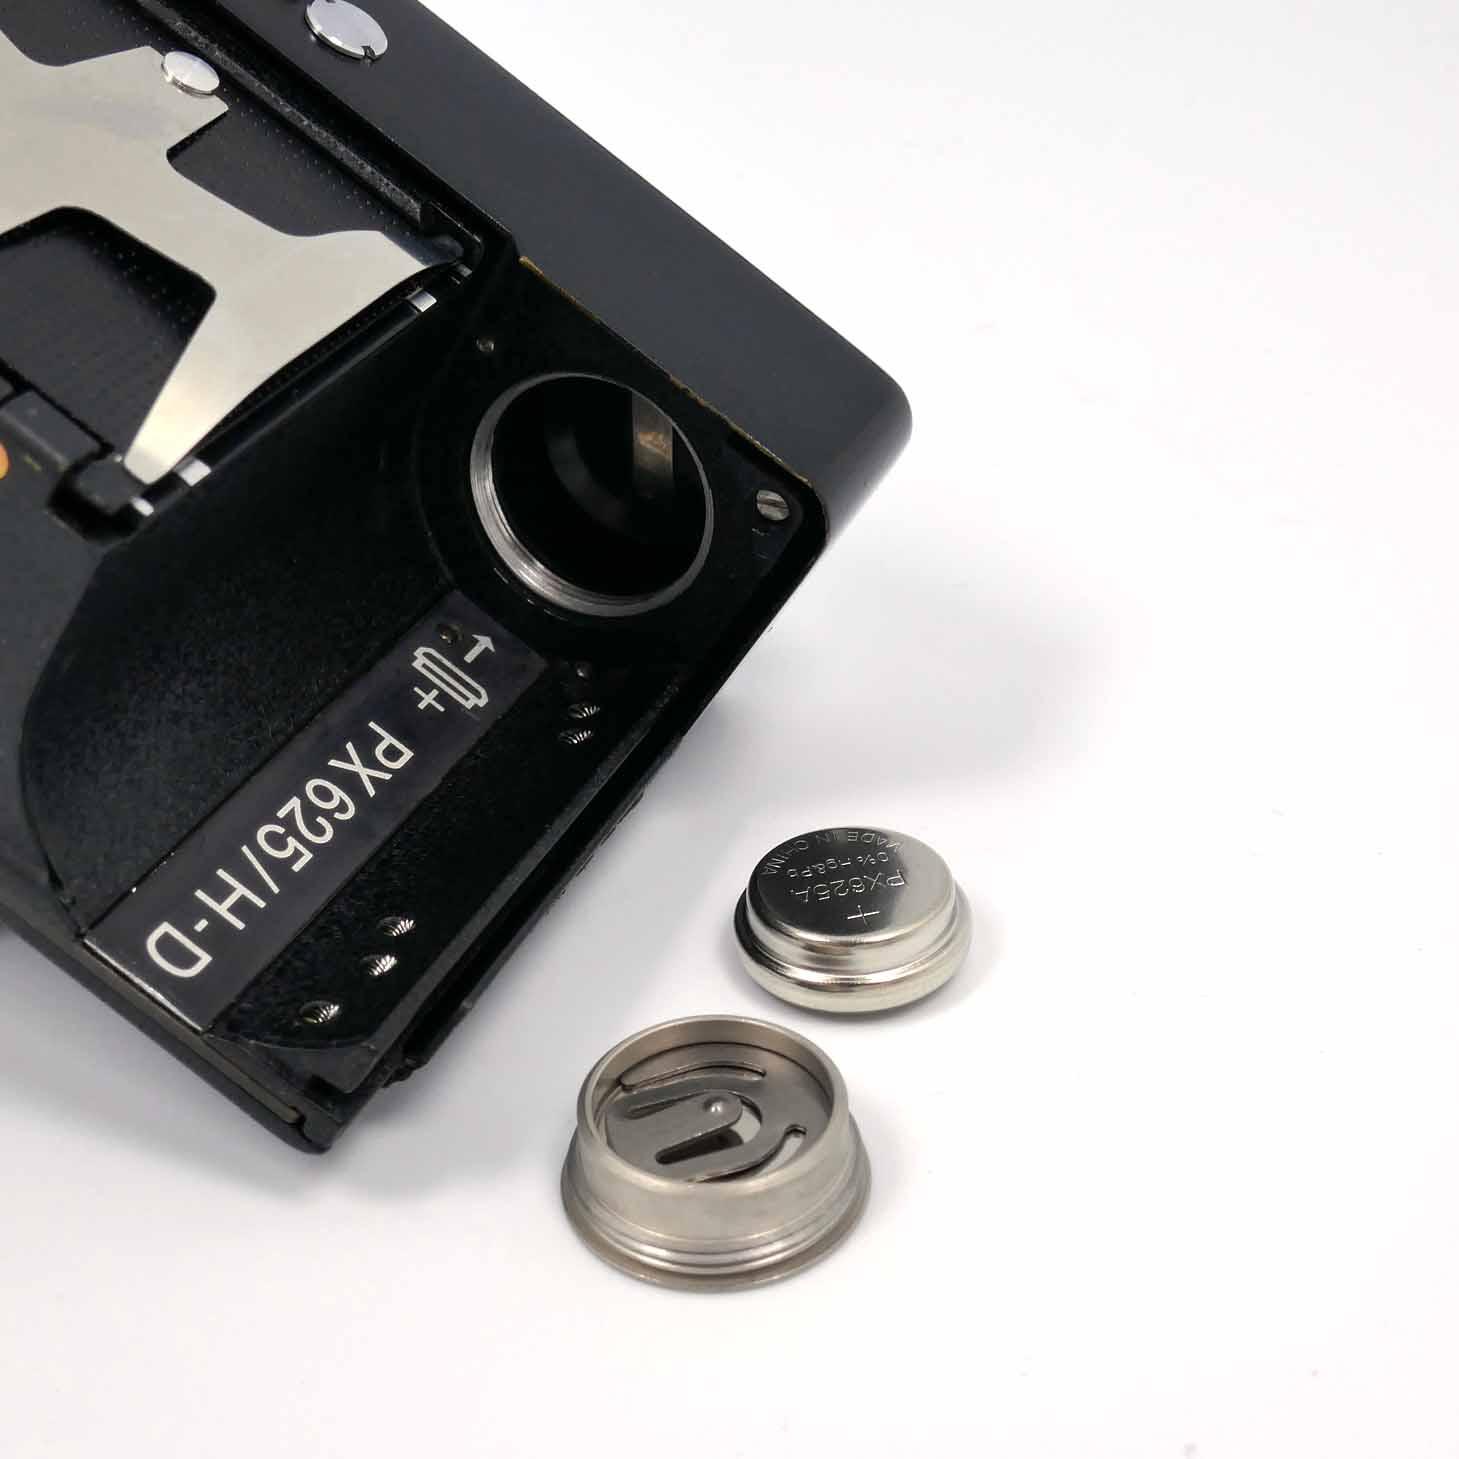 clean-cameras-Rollei-35-S--01